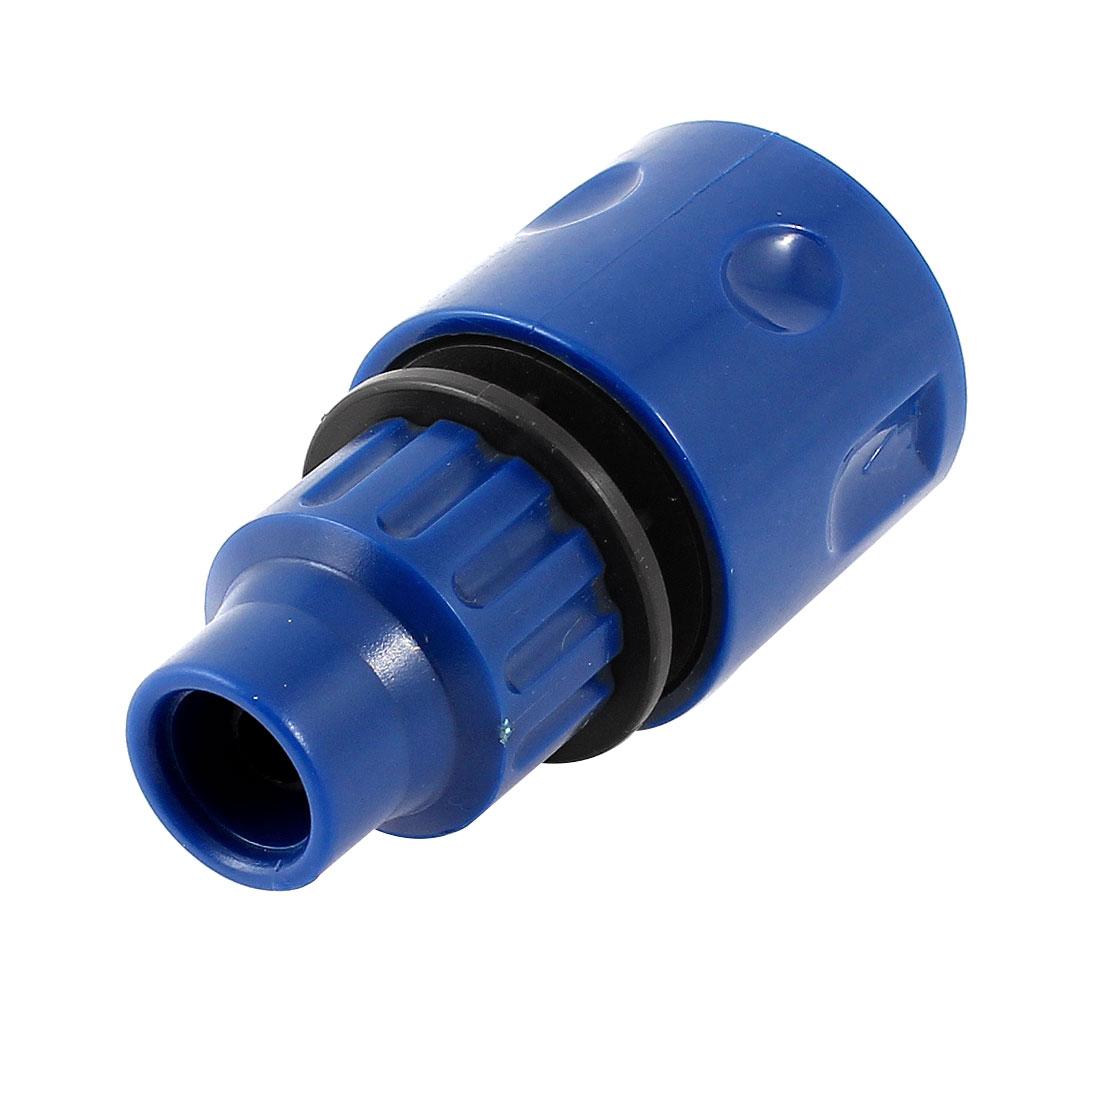 9-12mm Hose Range Garden Spray Water Nozzle Quick Adapter Blue